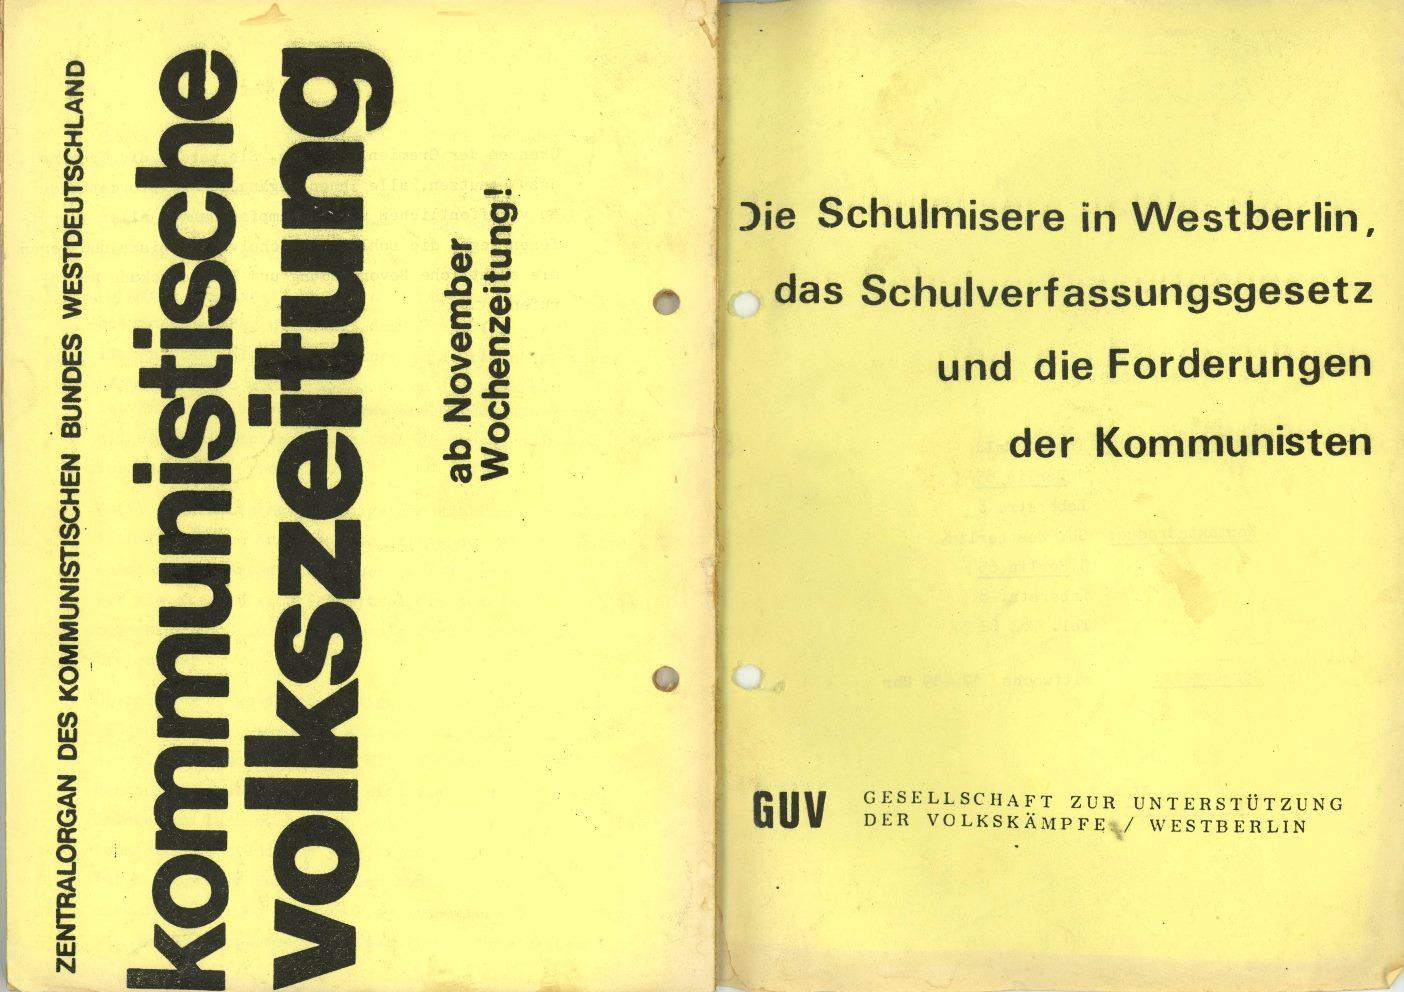 Berlin_SMV_GUV_1974_Schulmisere_01